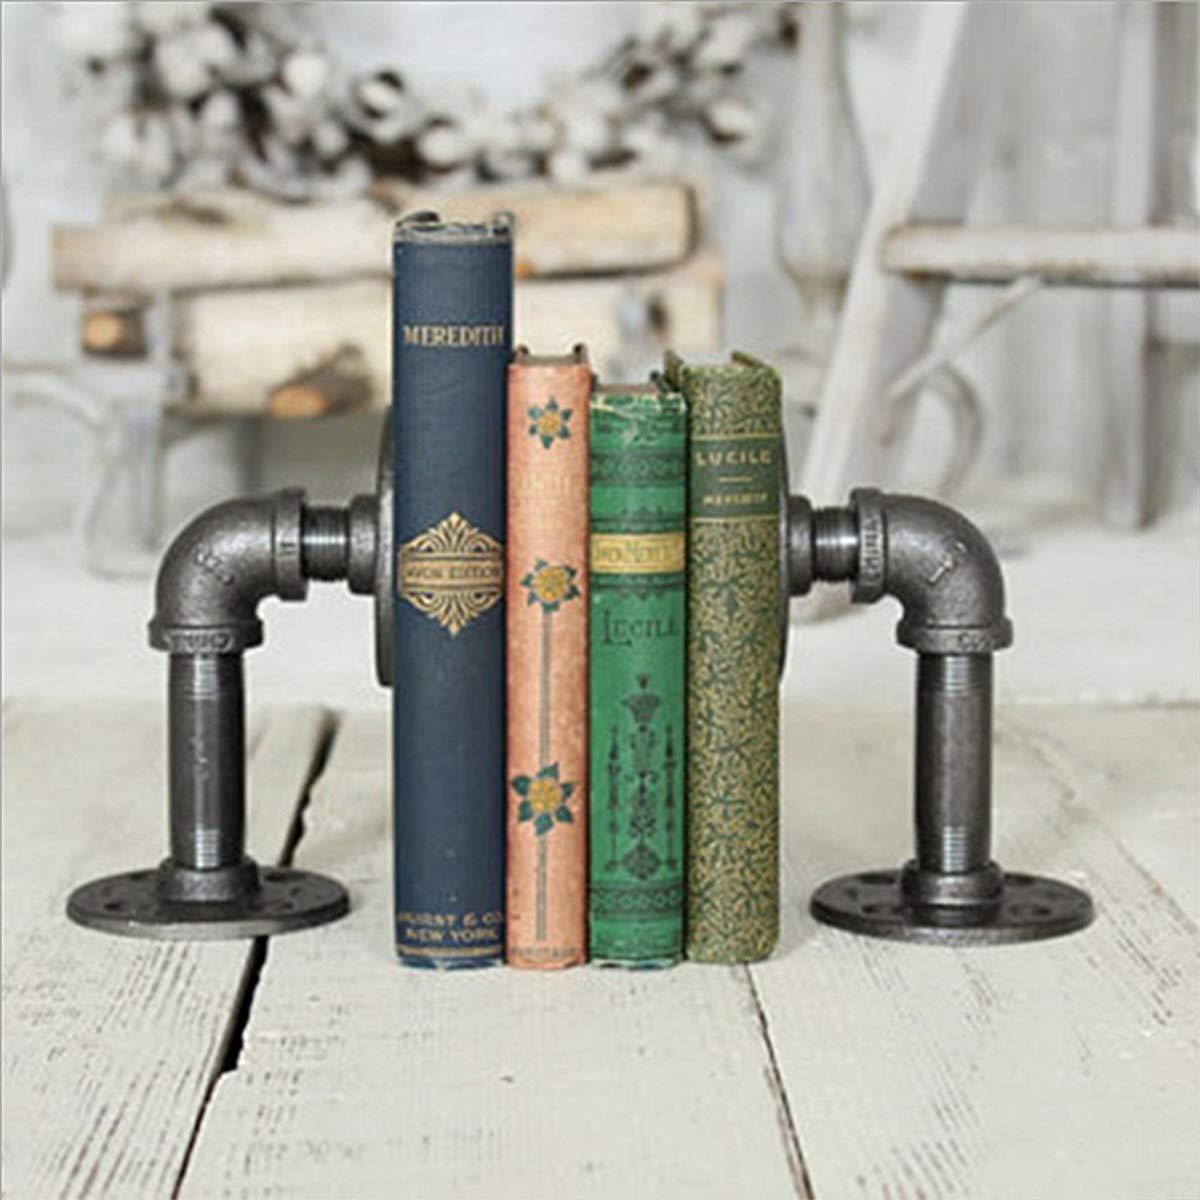 Warm Van Industrial Pipe Bookends,Floating Decor Pipe Shelf,Vintage Metal Brackets,Wall Mount Diy Storage Bookshelves,Office Desk Bookmark (2pcs)